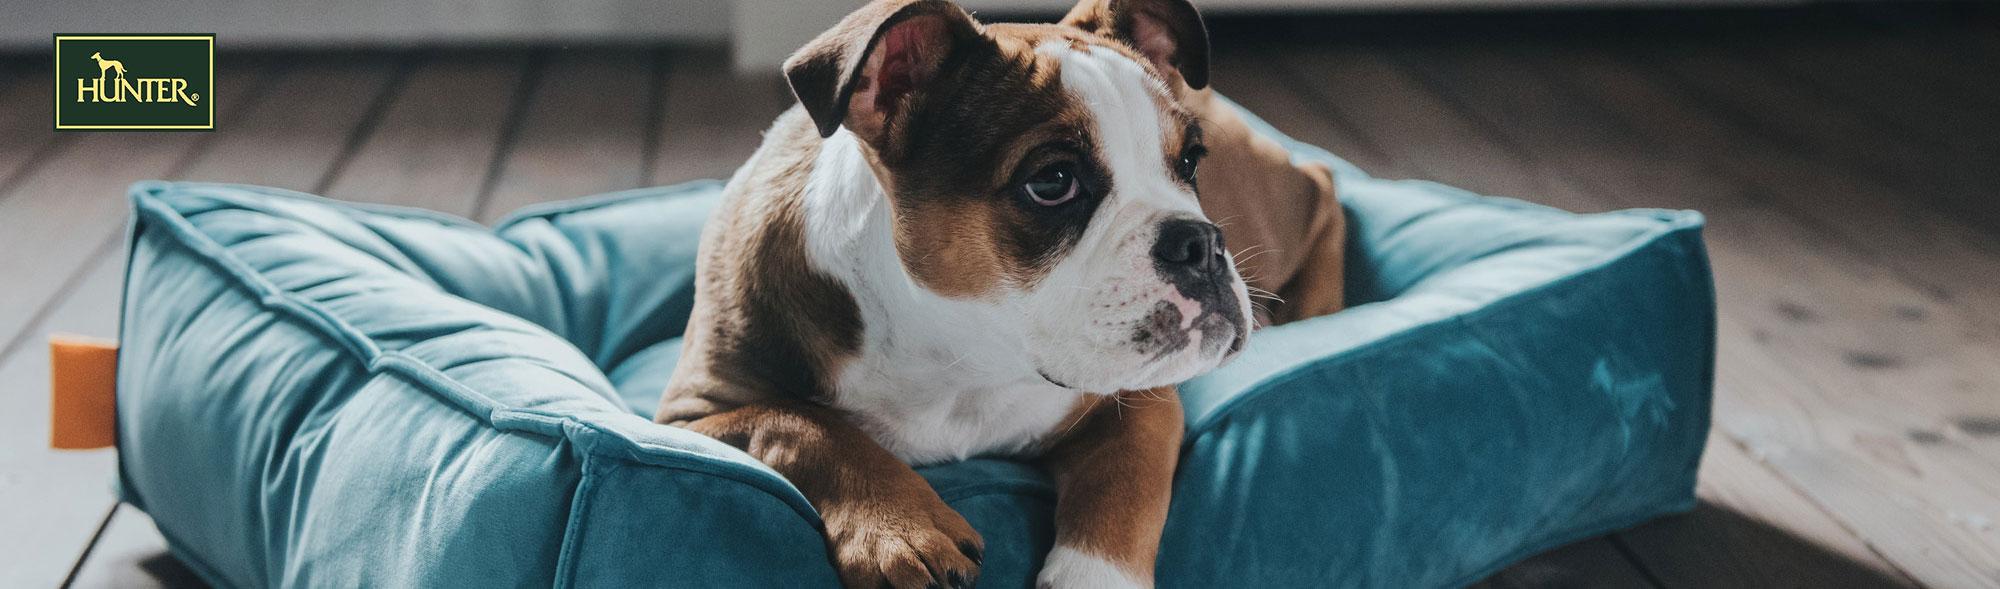 Hunter Hundekissen online bestellen